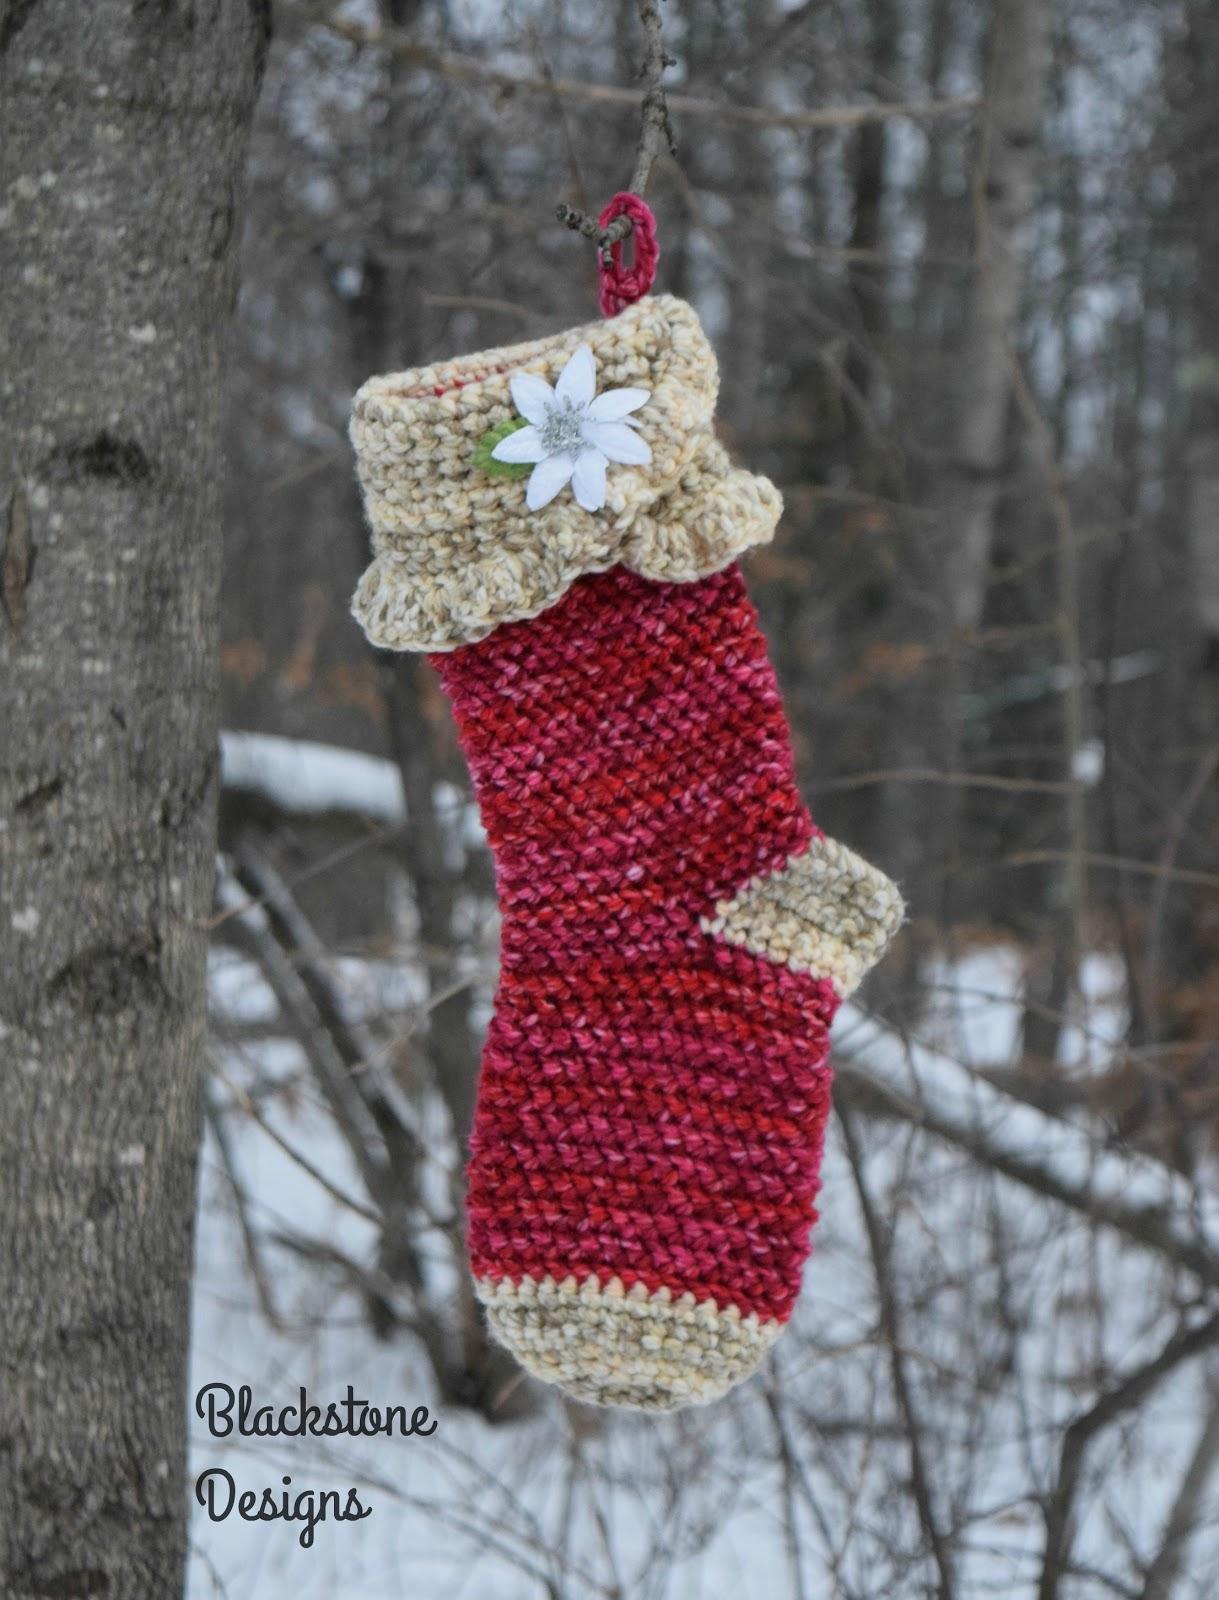 Victorian Christmas Stockings.Victorian Christmas Stocking Blackstone Designs